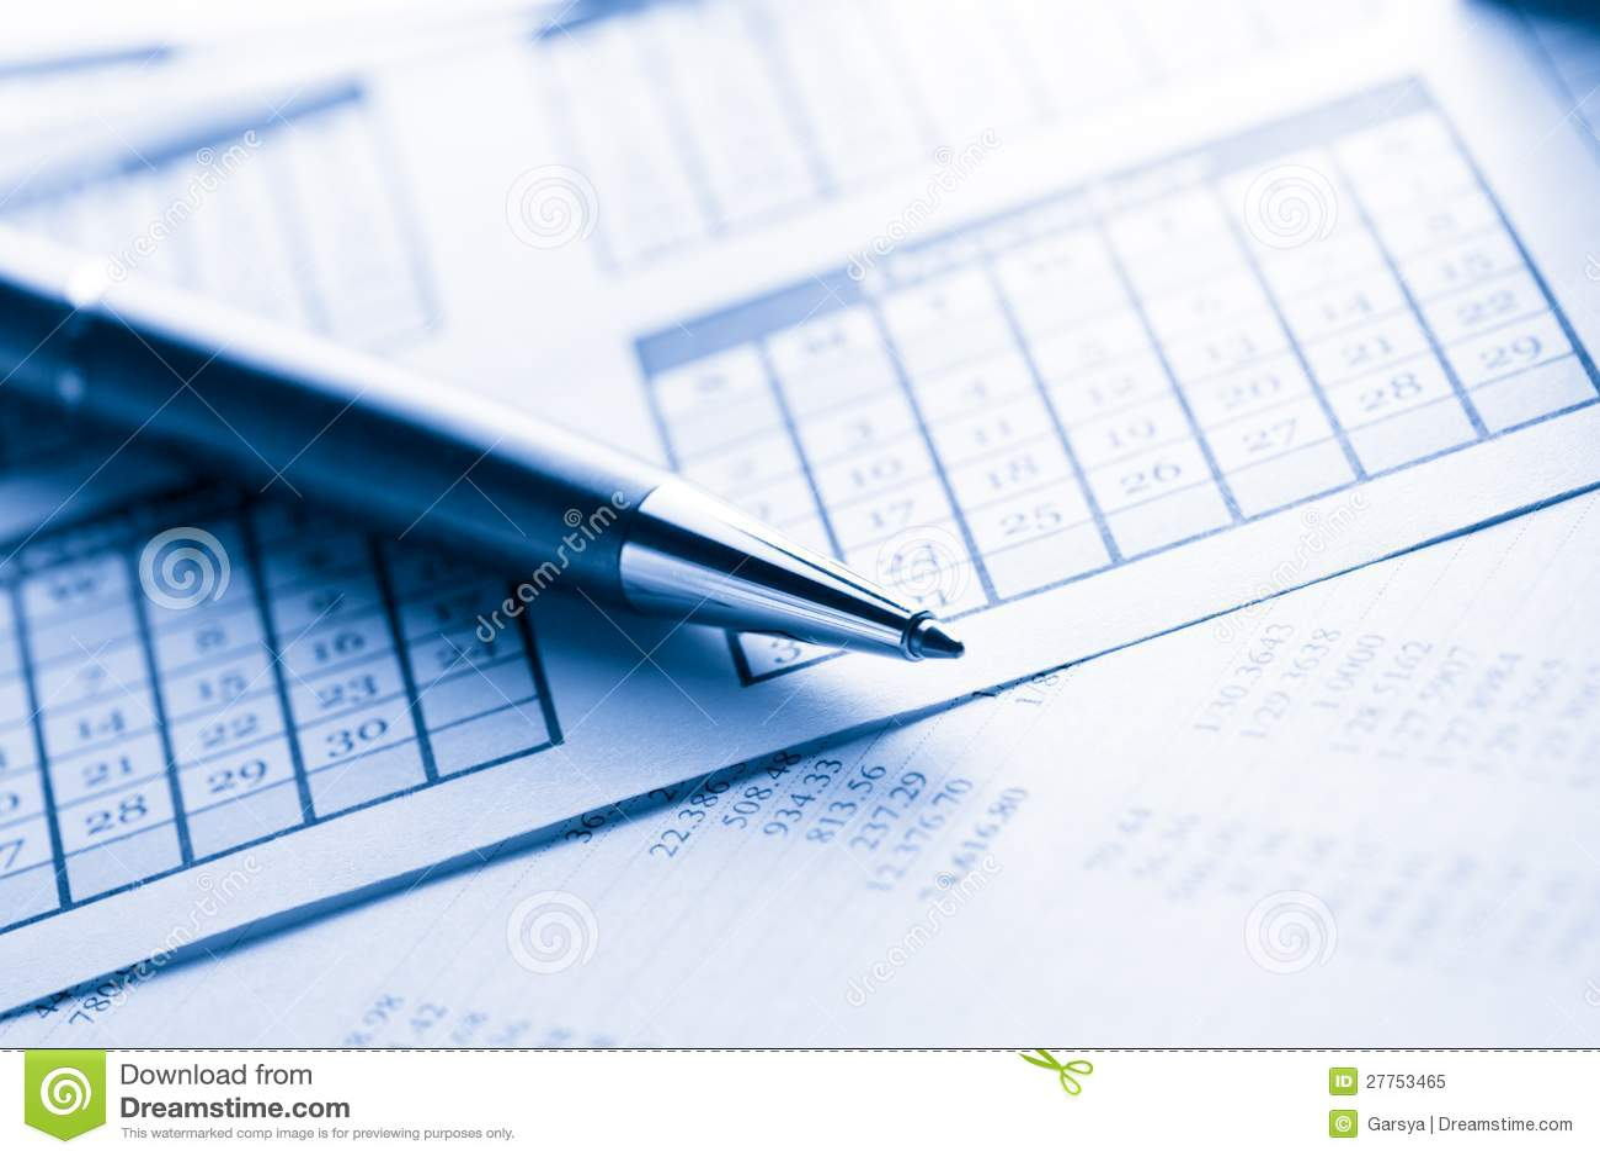 Calendrier et stylo